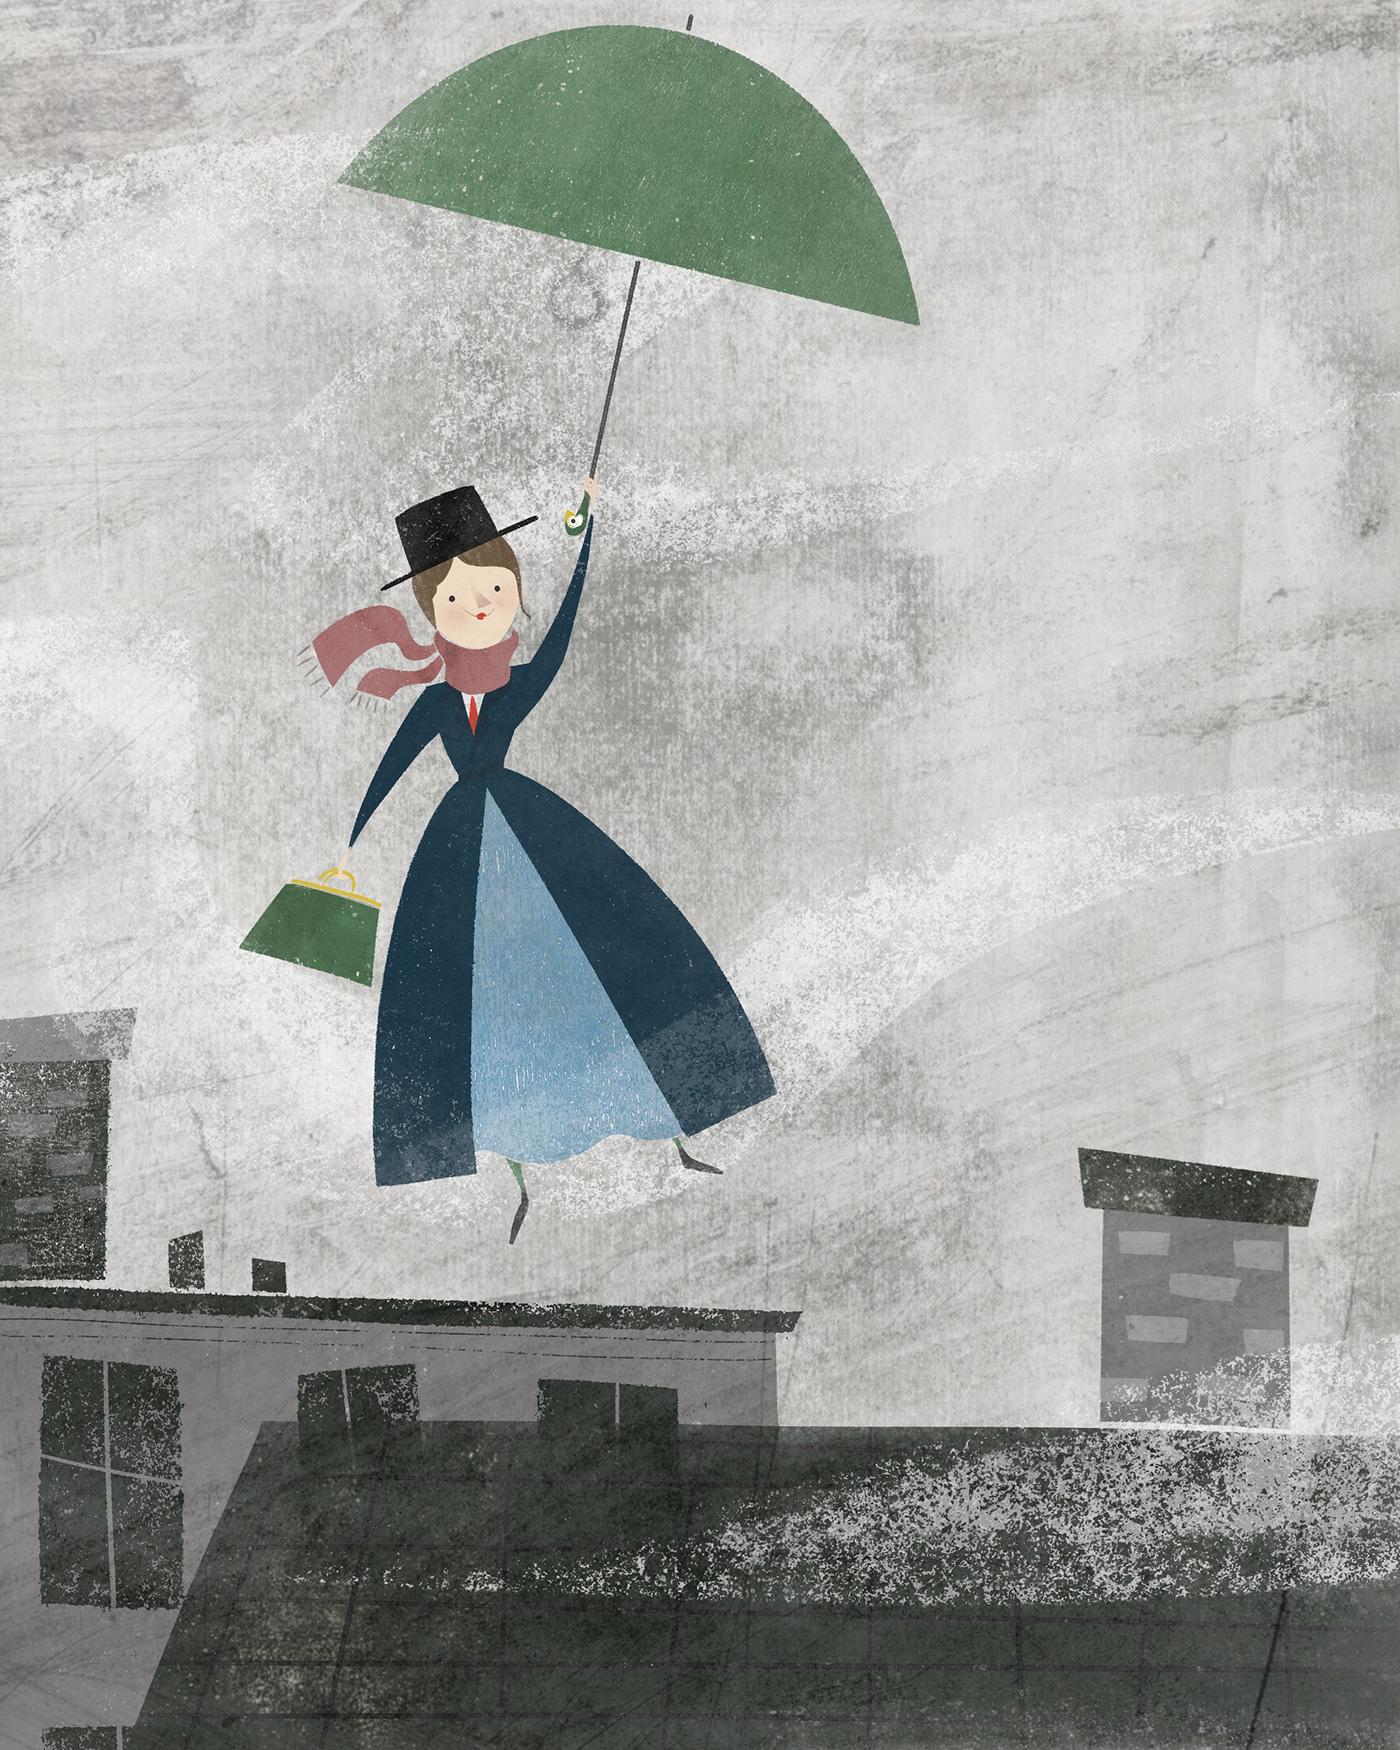 Image may contain: umbrella, accessory and cartoon